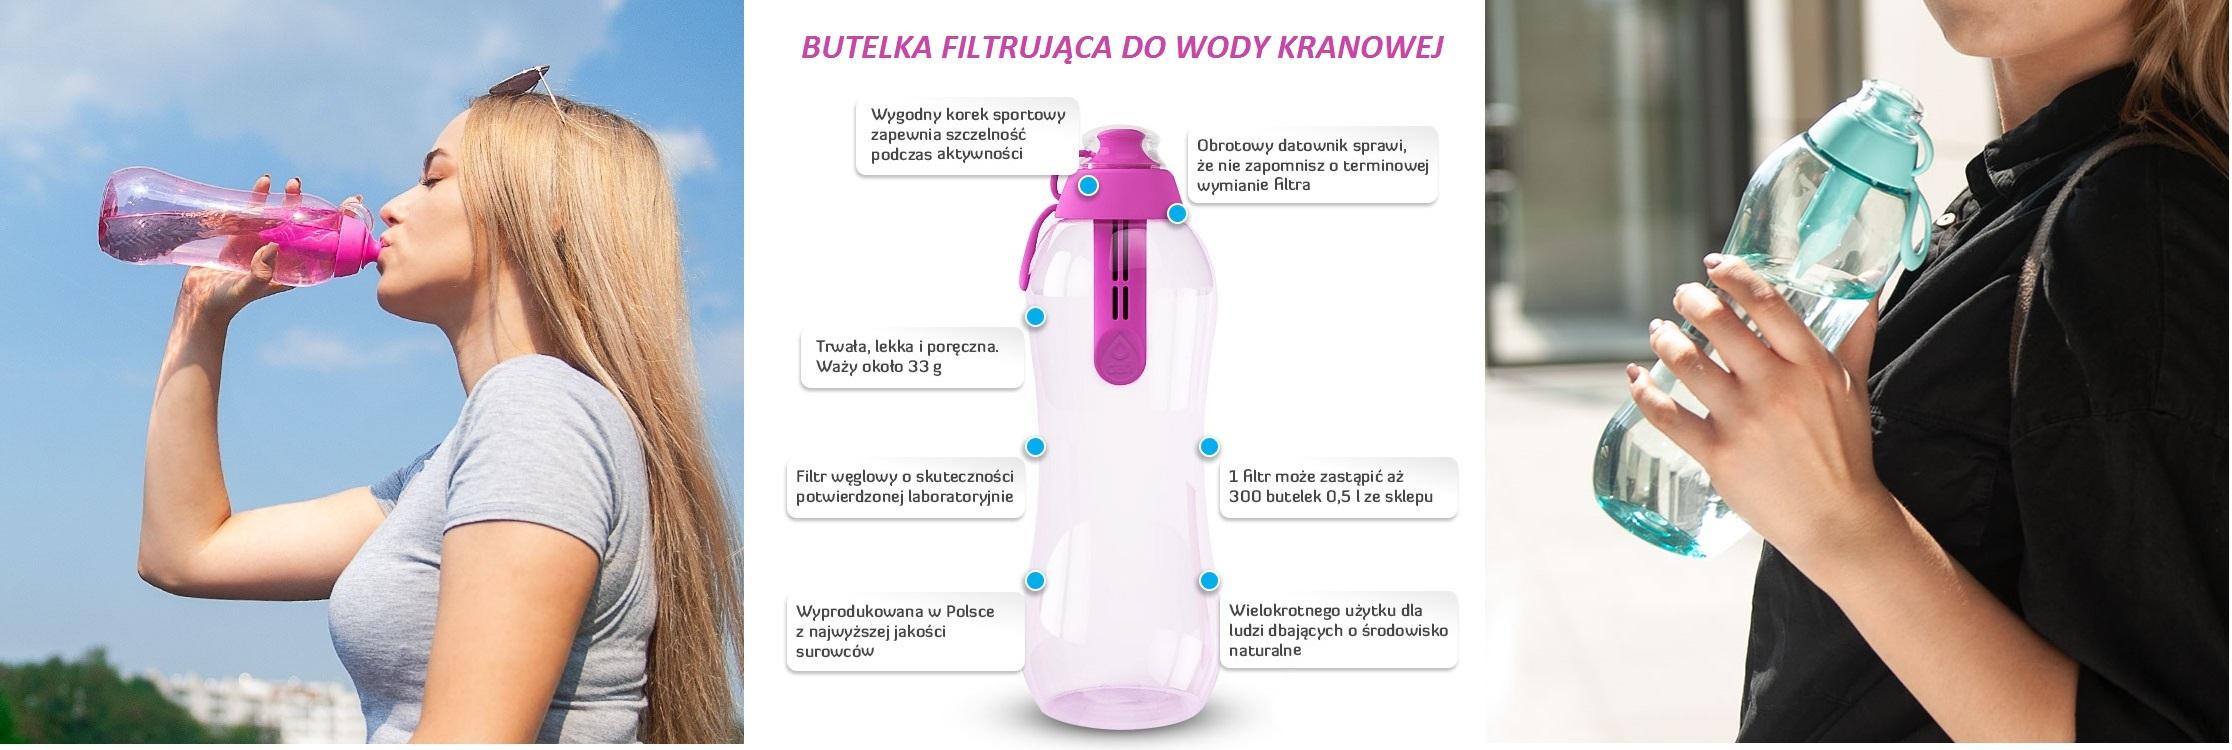 butelka_filtrujaca_02.jpg